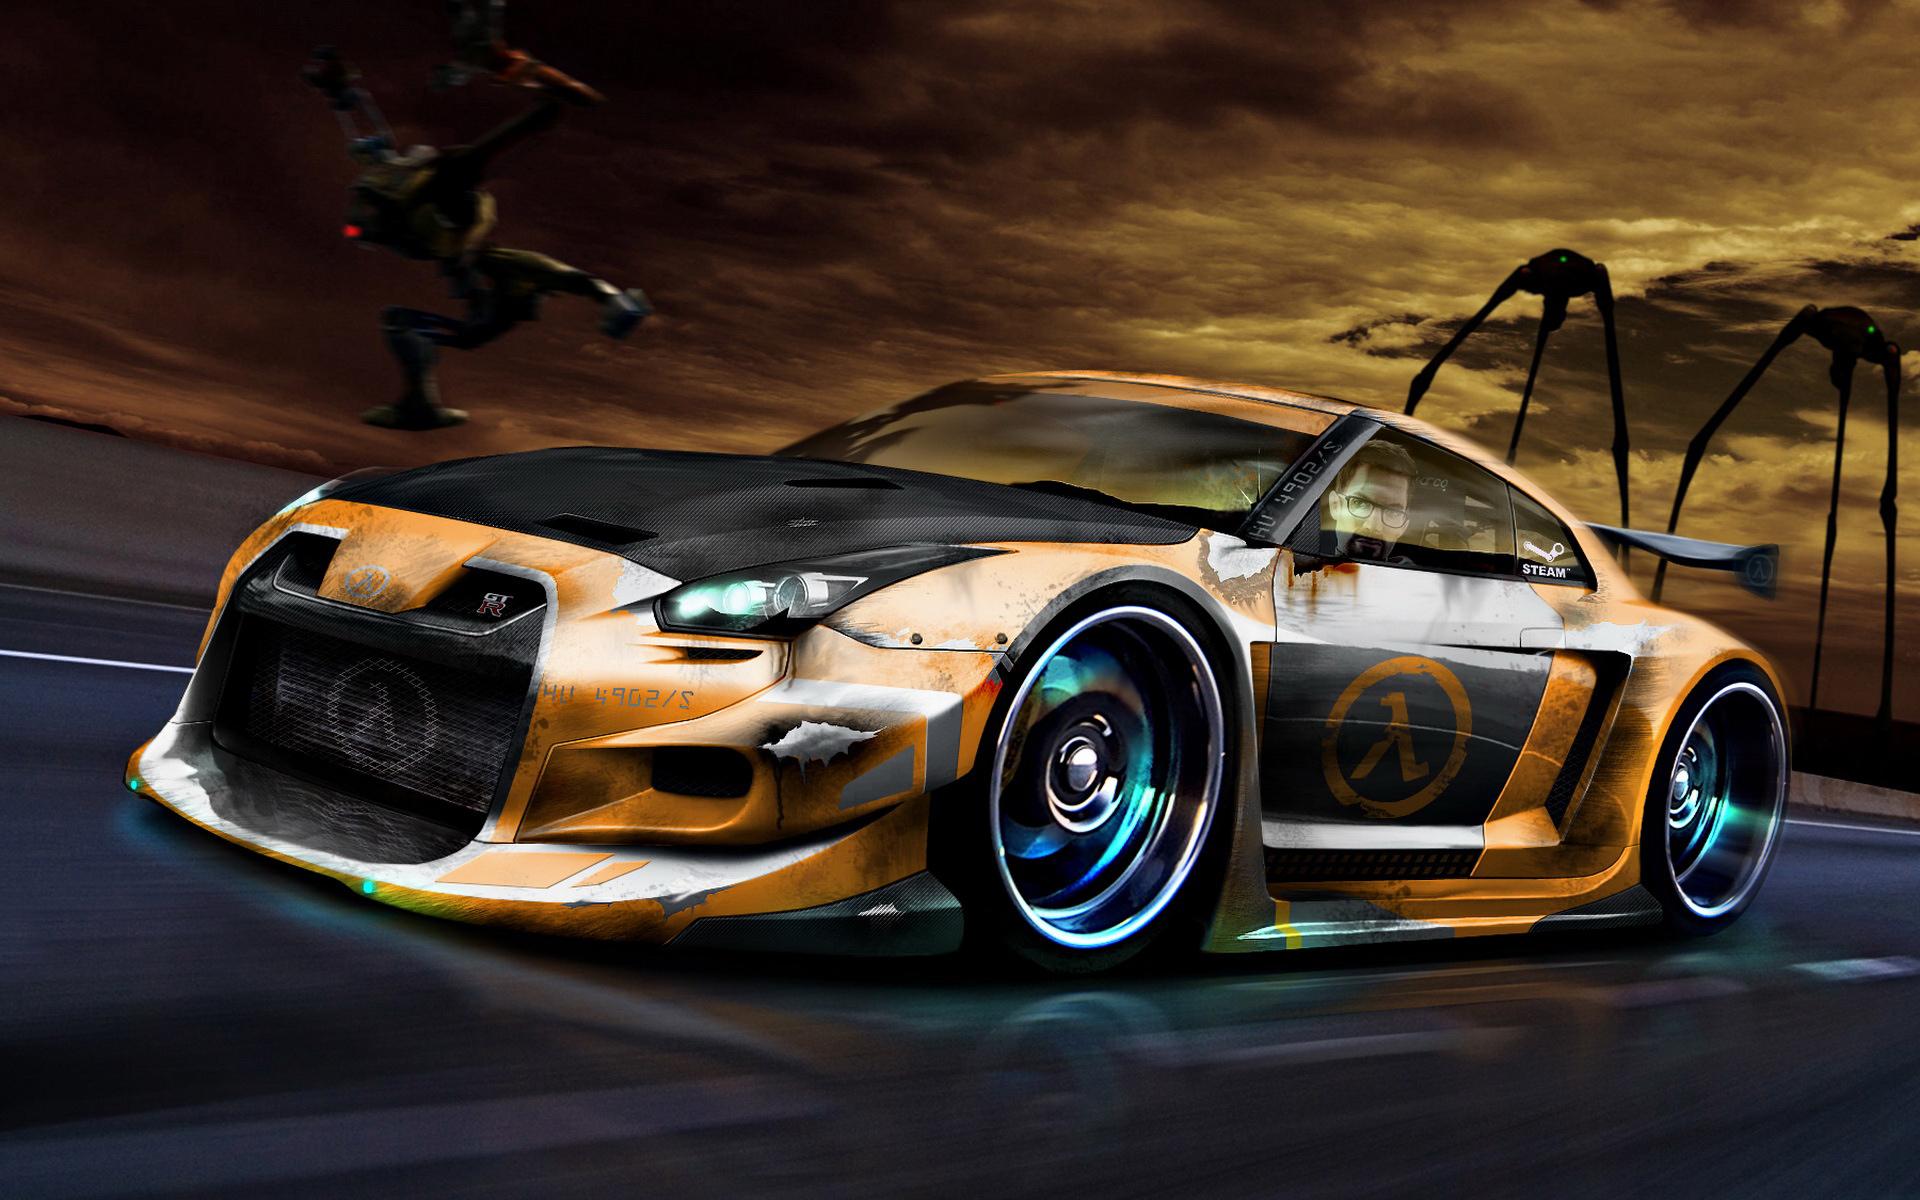 Racing Car Hd Wallpaper Free Download Cool Car Wallpapers Download Free Pixelstalk Net